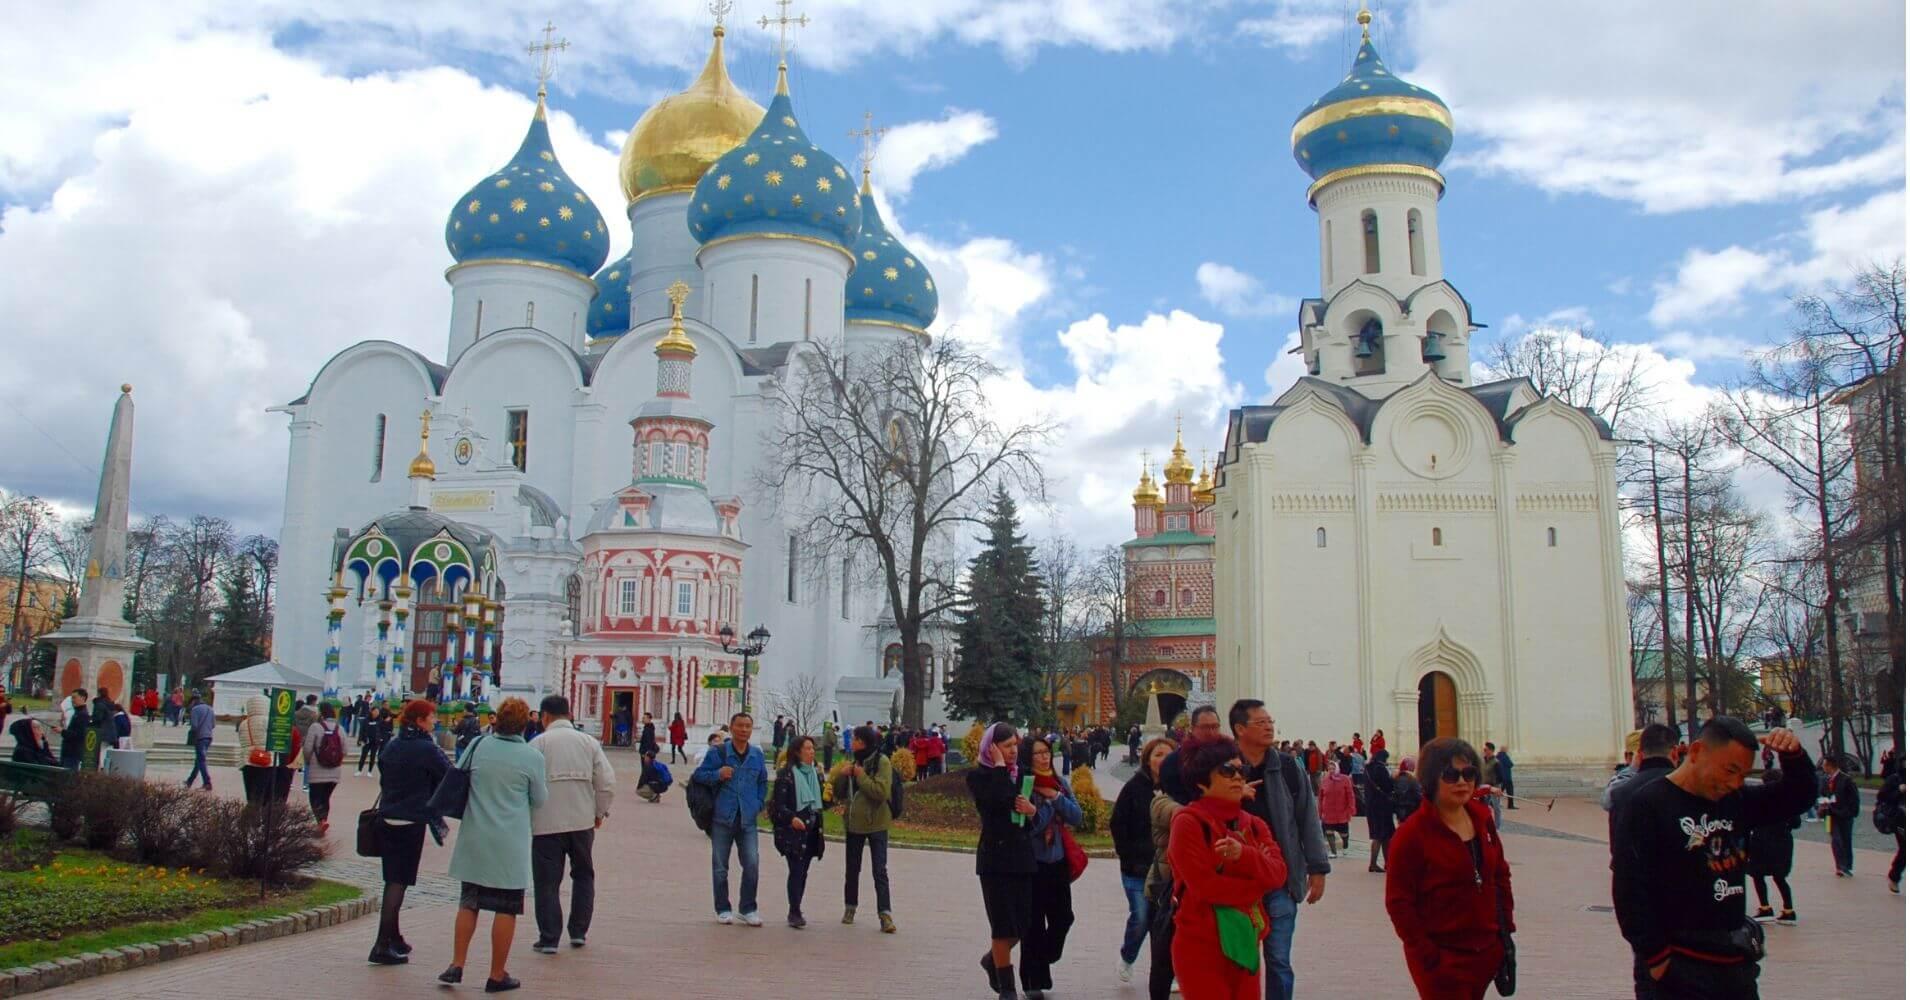 Monasterios de Sergiev Posad, Rusia.